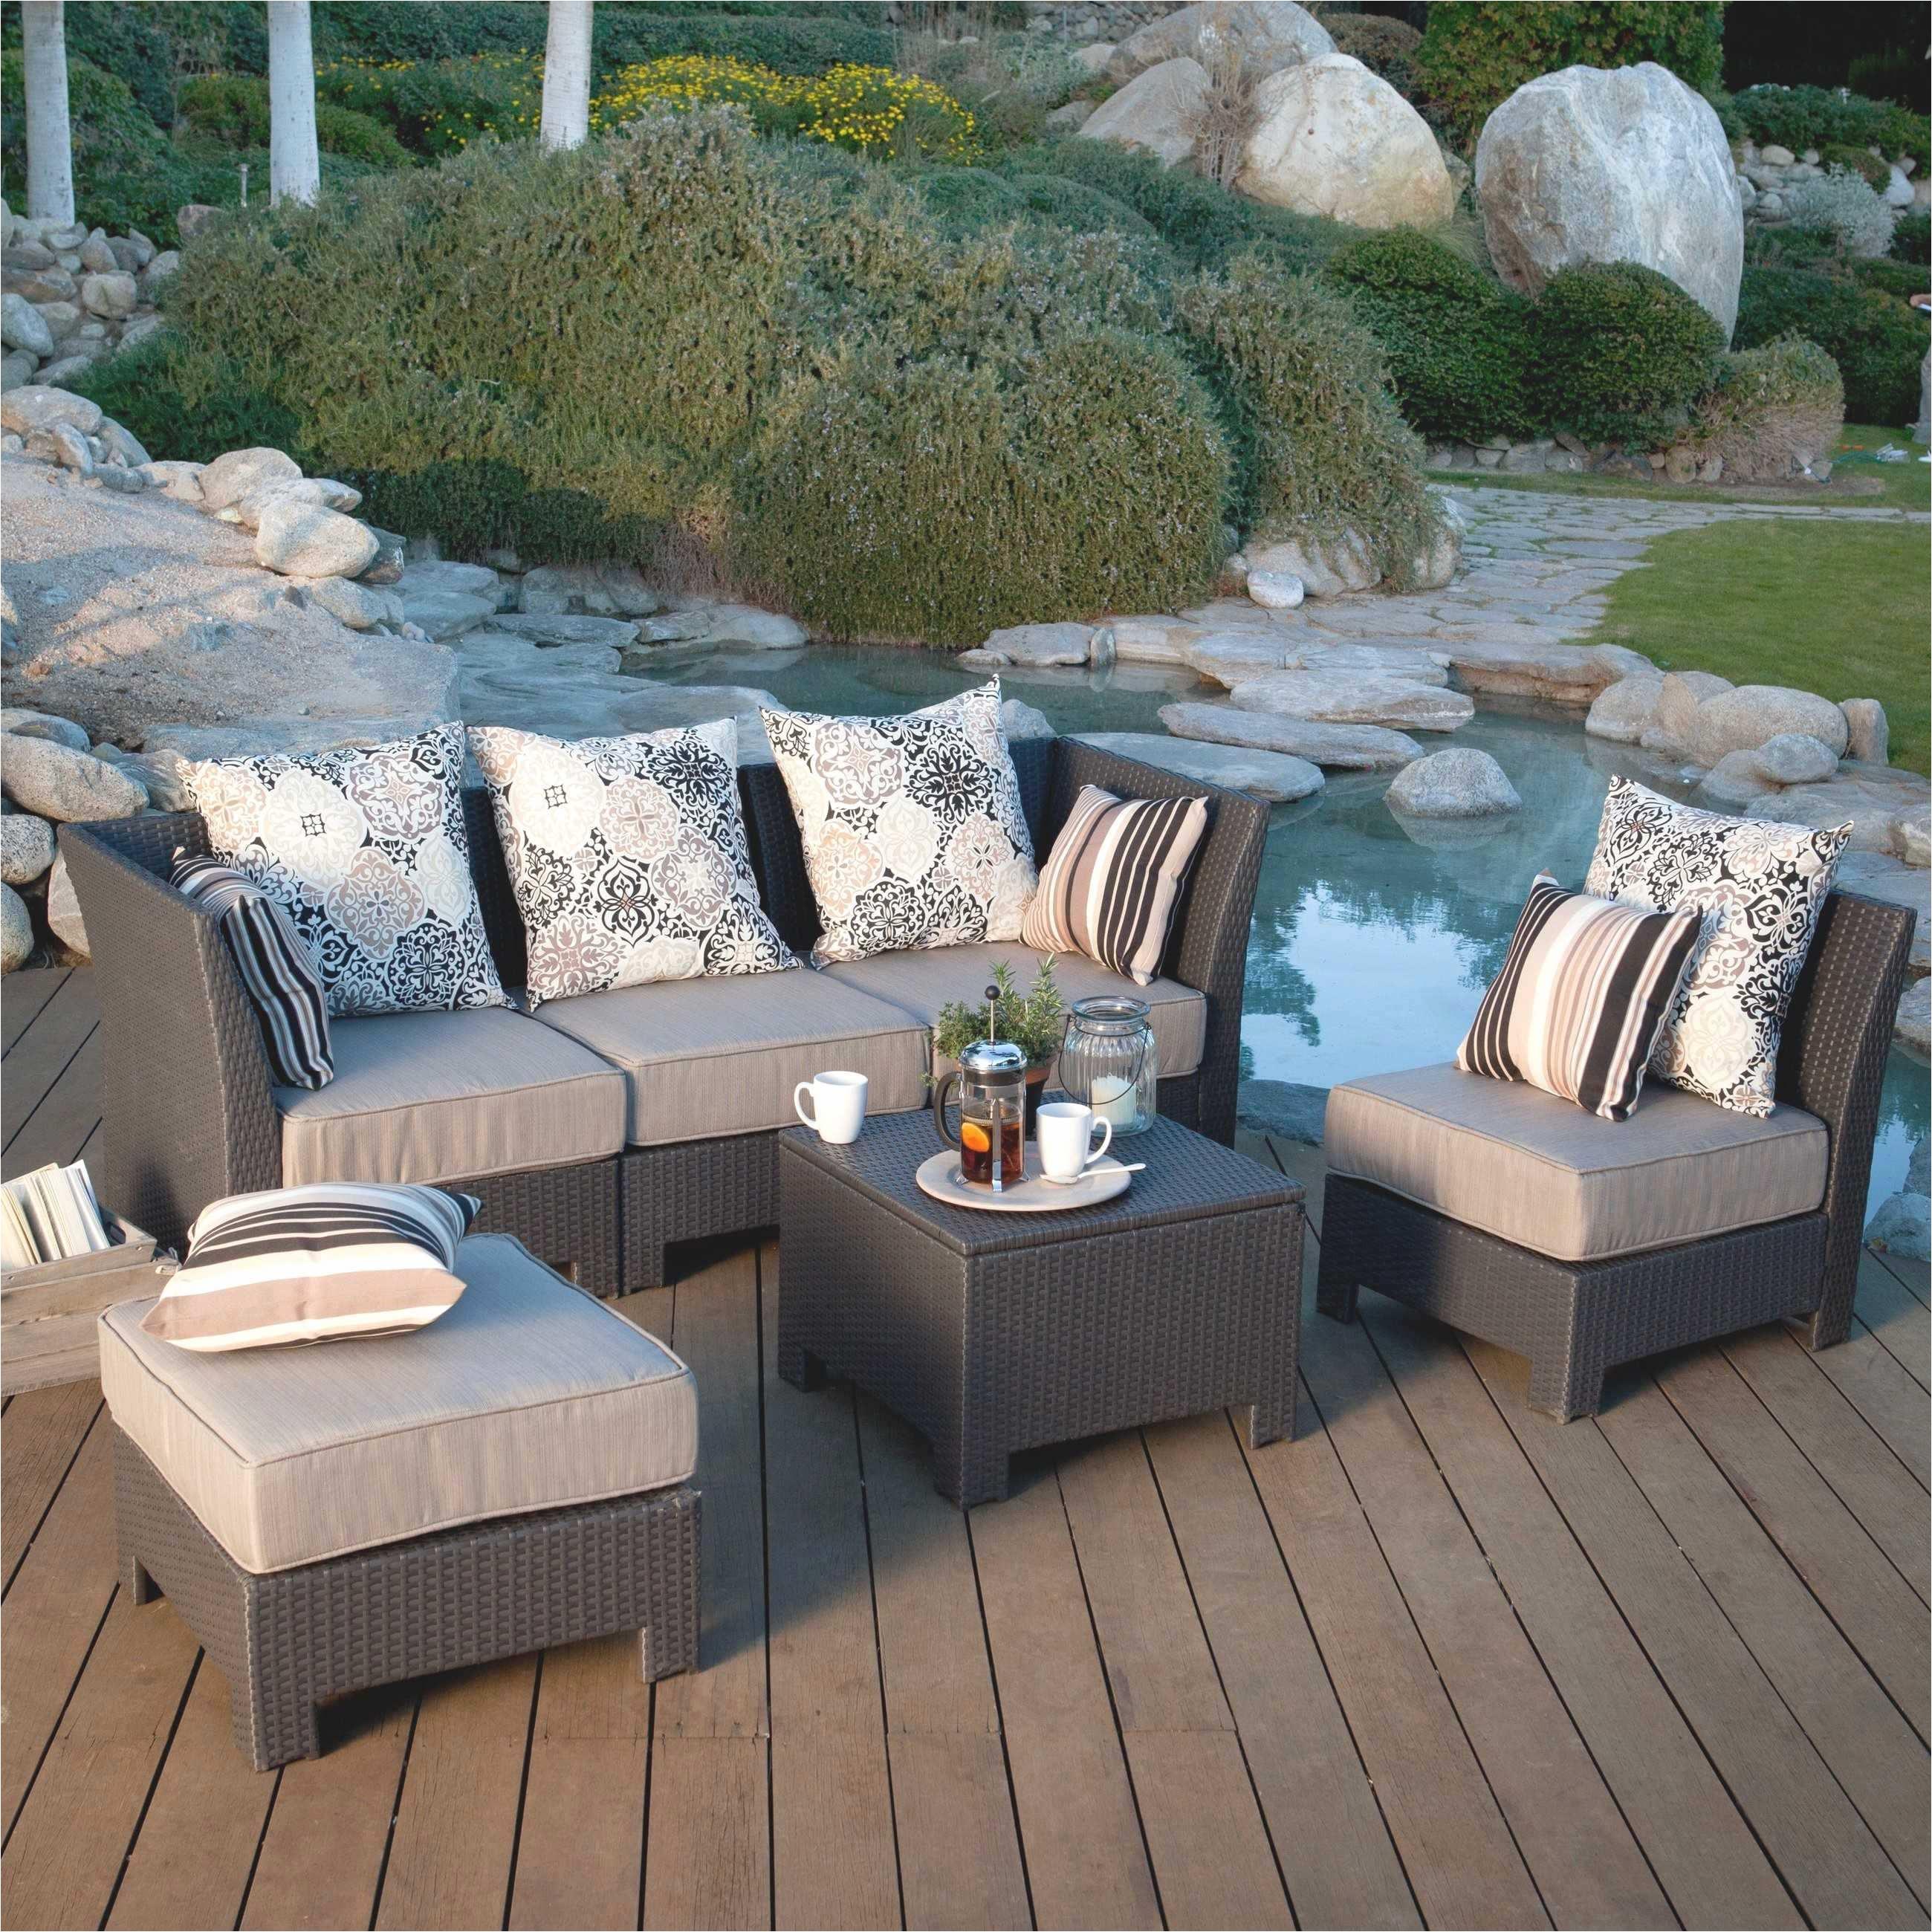 beautiful replacement fabric for hampton bay patio furniture for patio chair replacement parts fresh furniture hampton